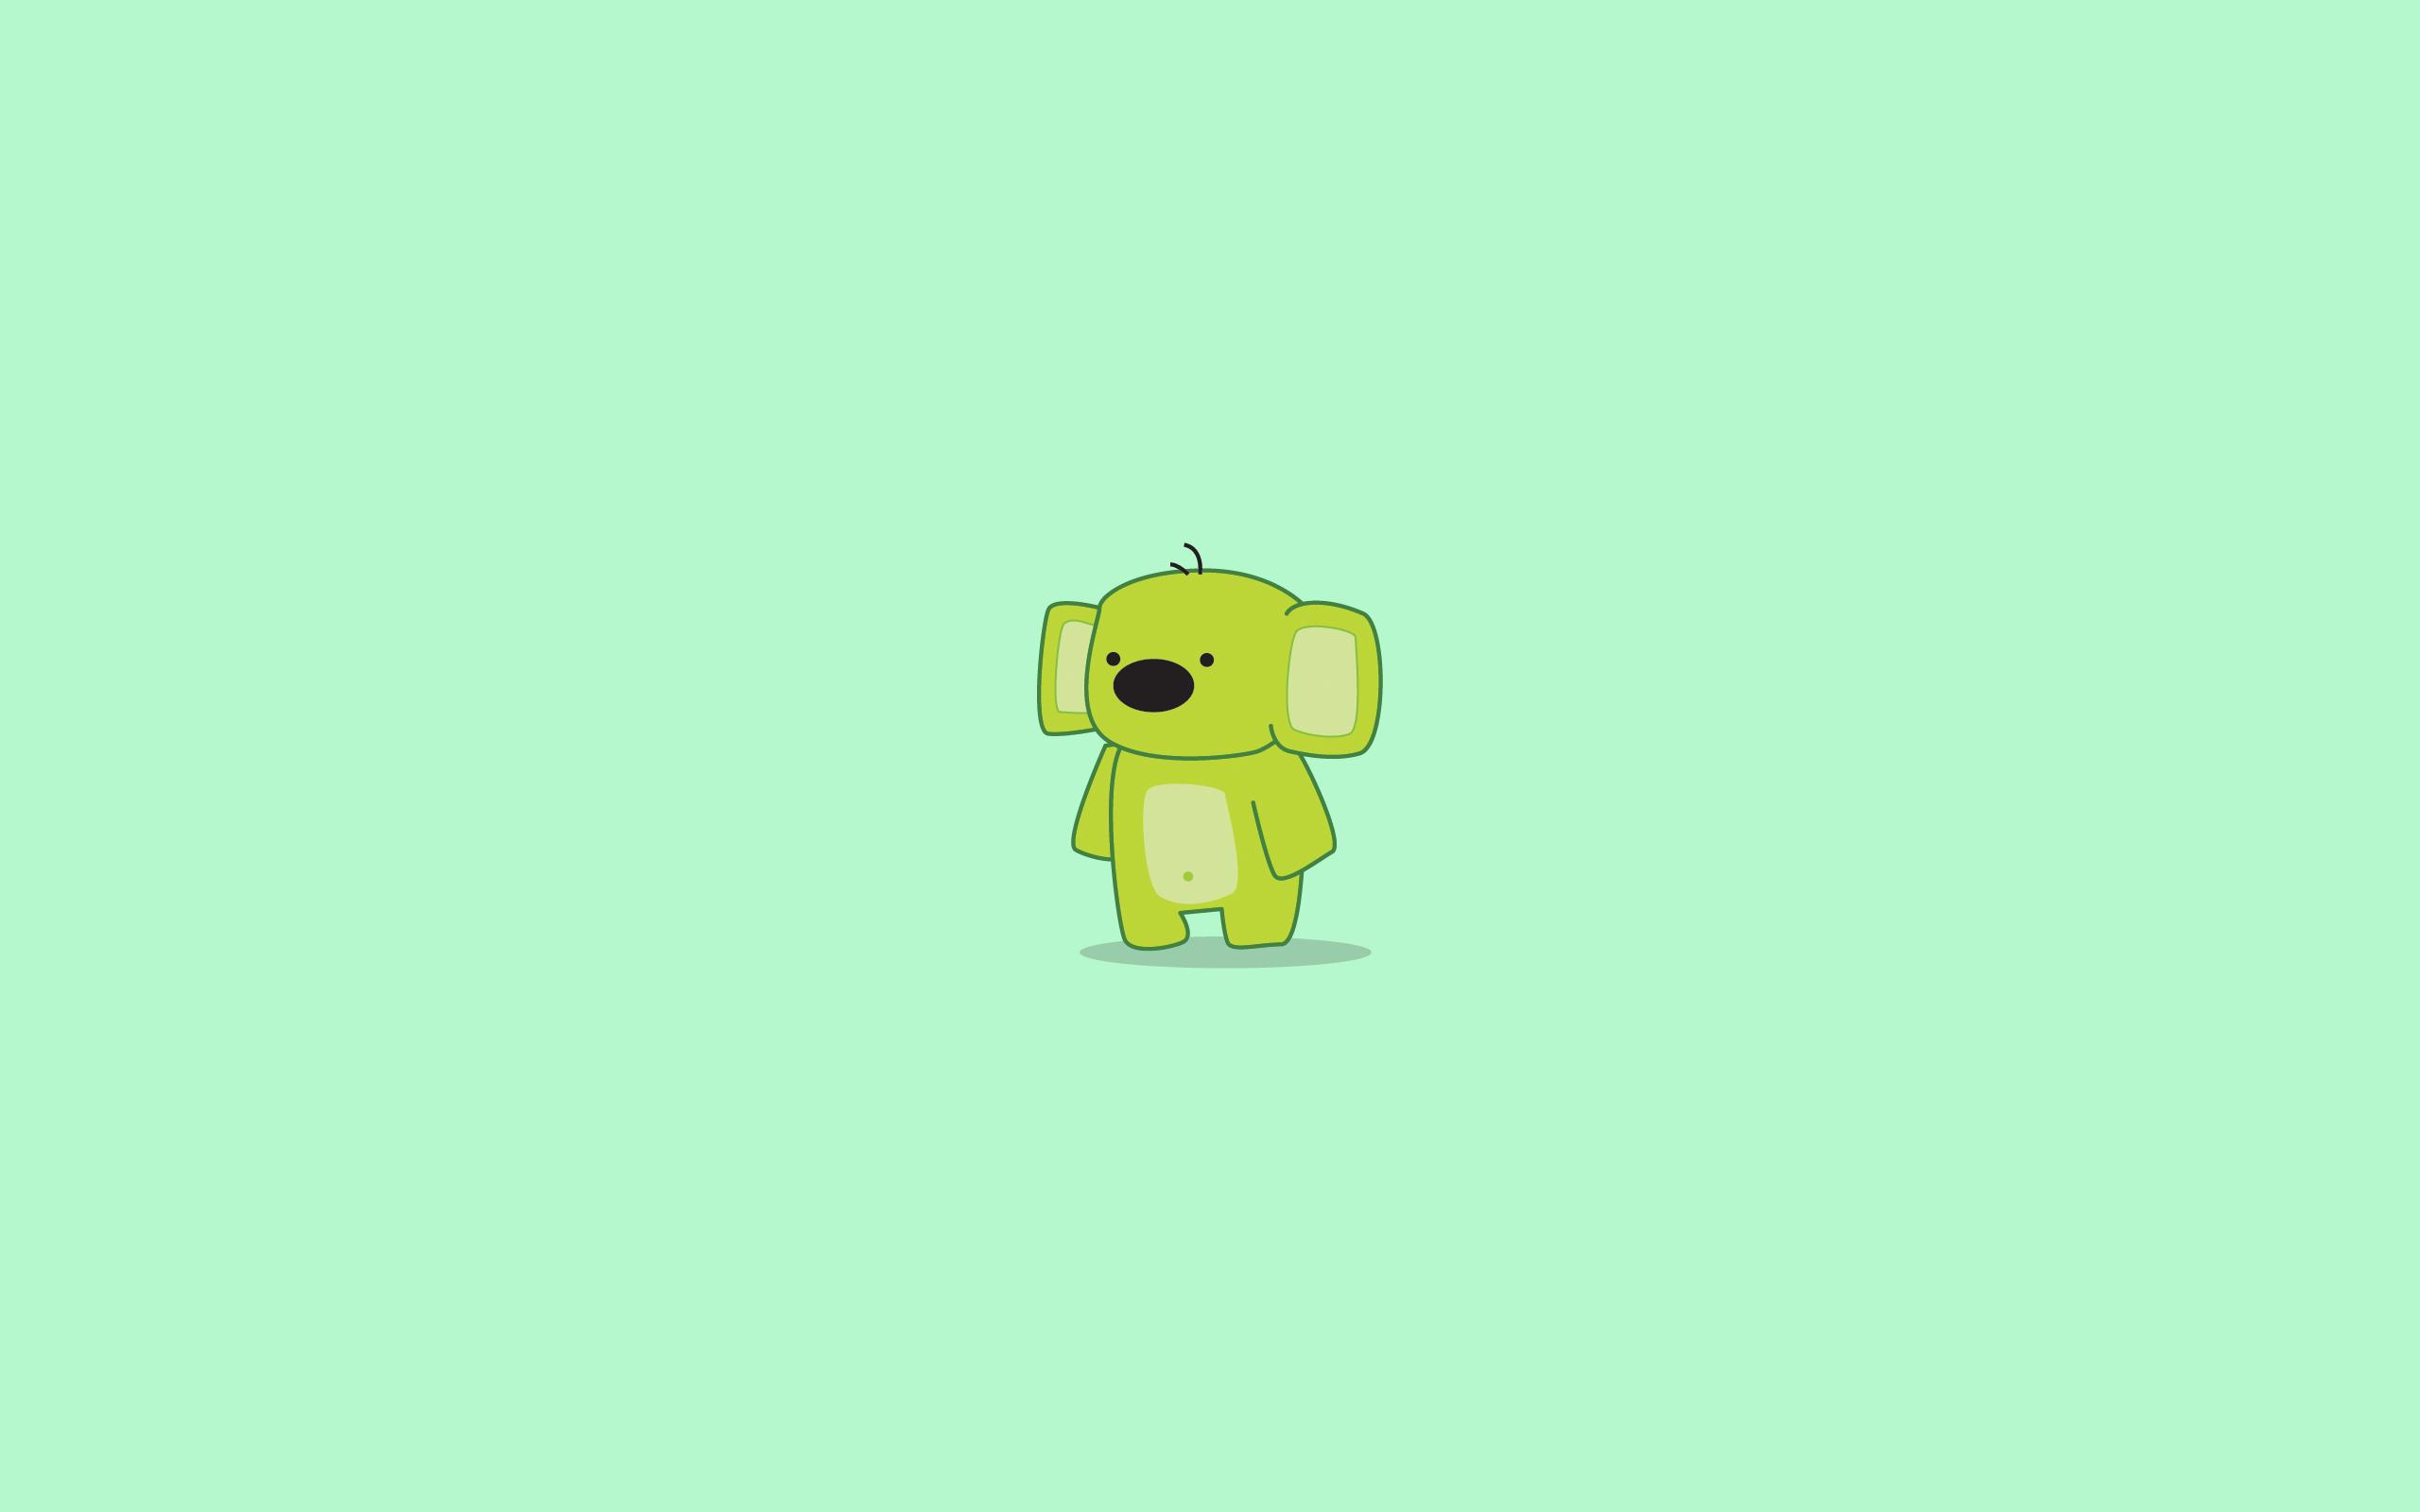 Kiwi Desktop Png 2560 1600 Koala Drawing Koala Minimal Wallpaper